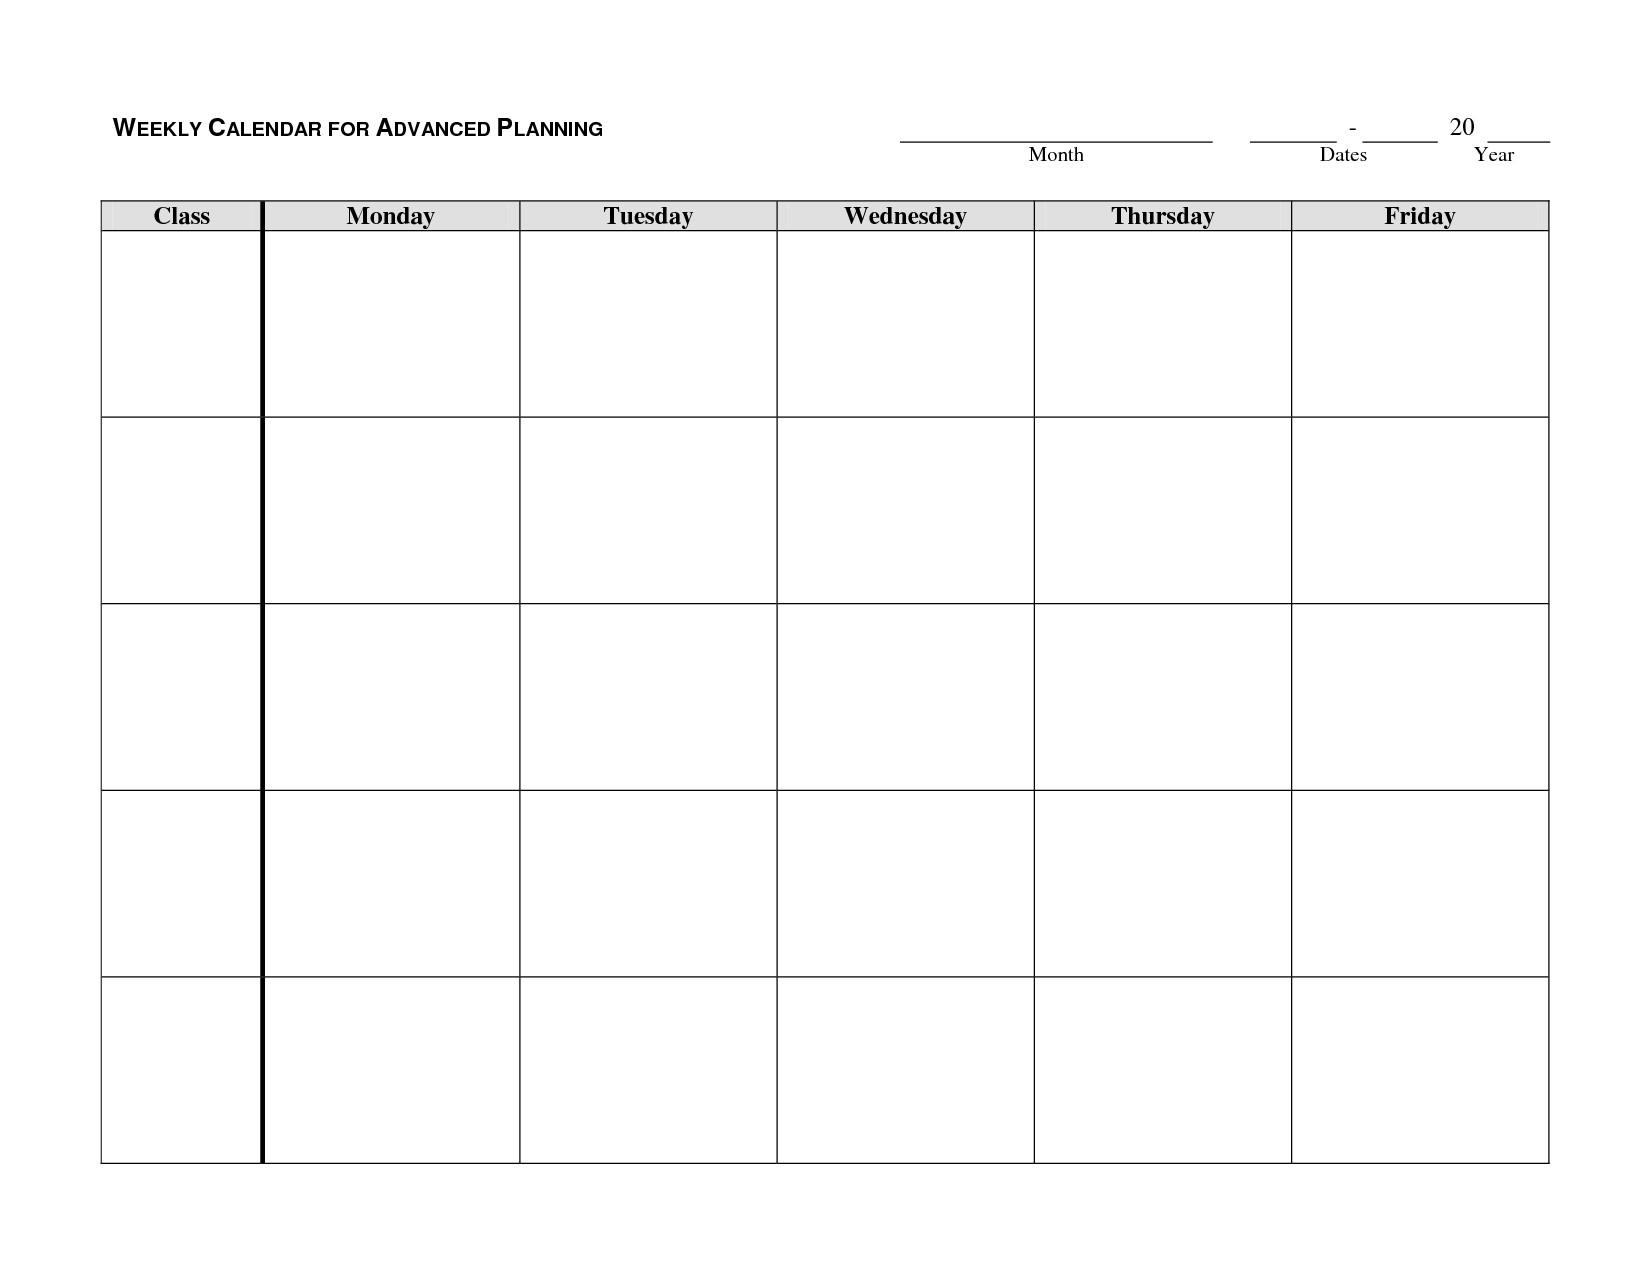 Editable Monday Through Friday Weekly Calendar